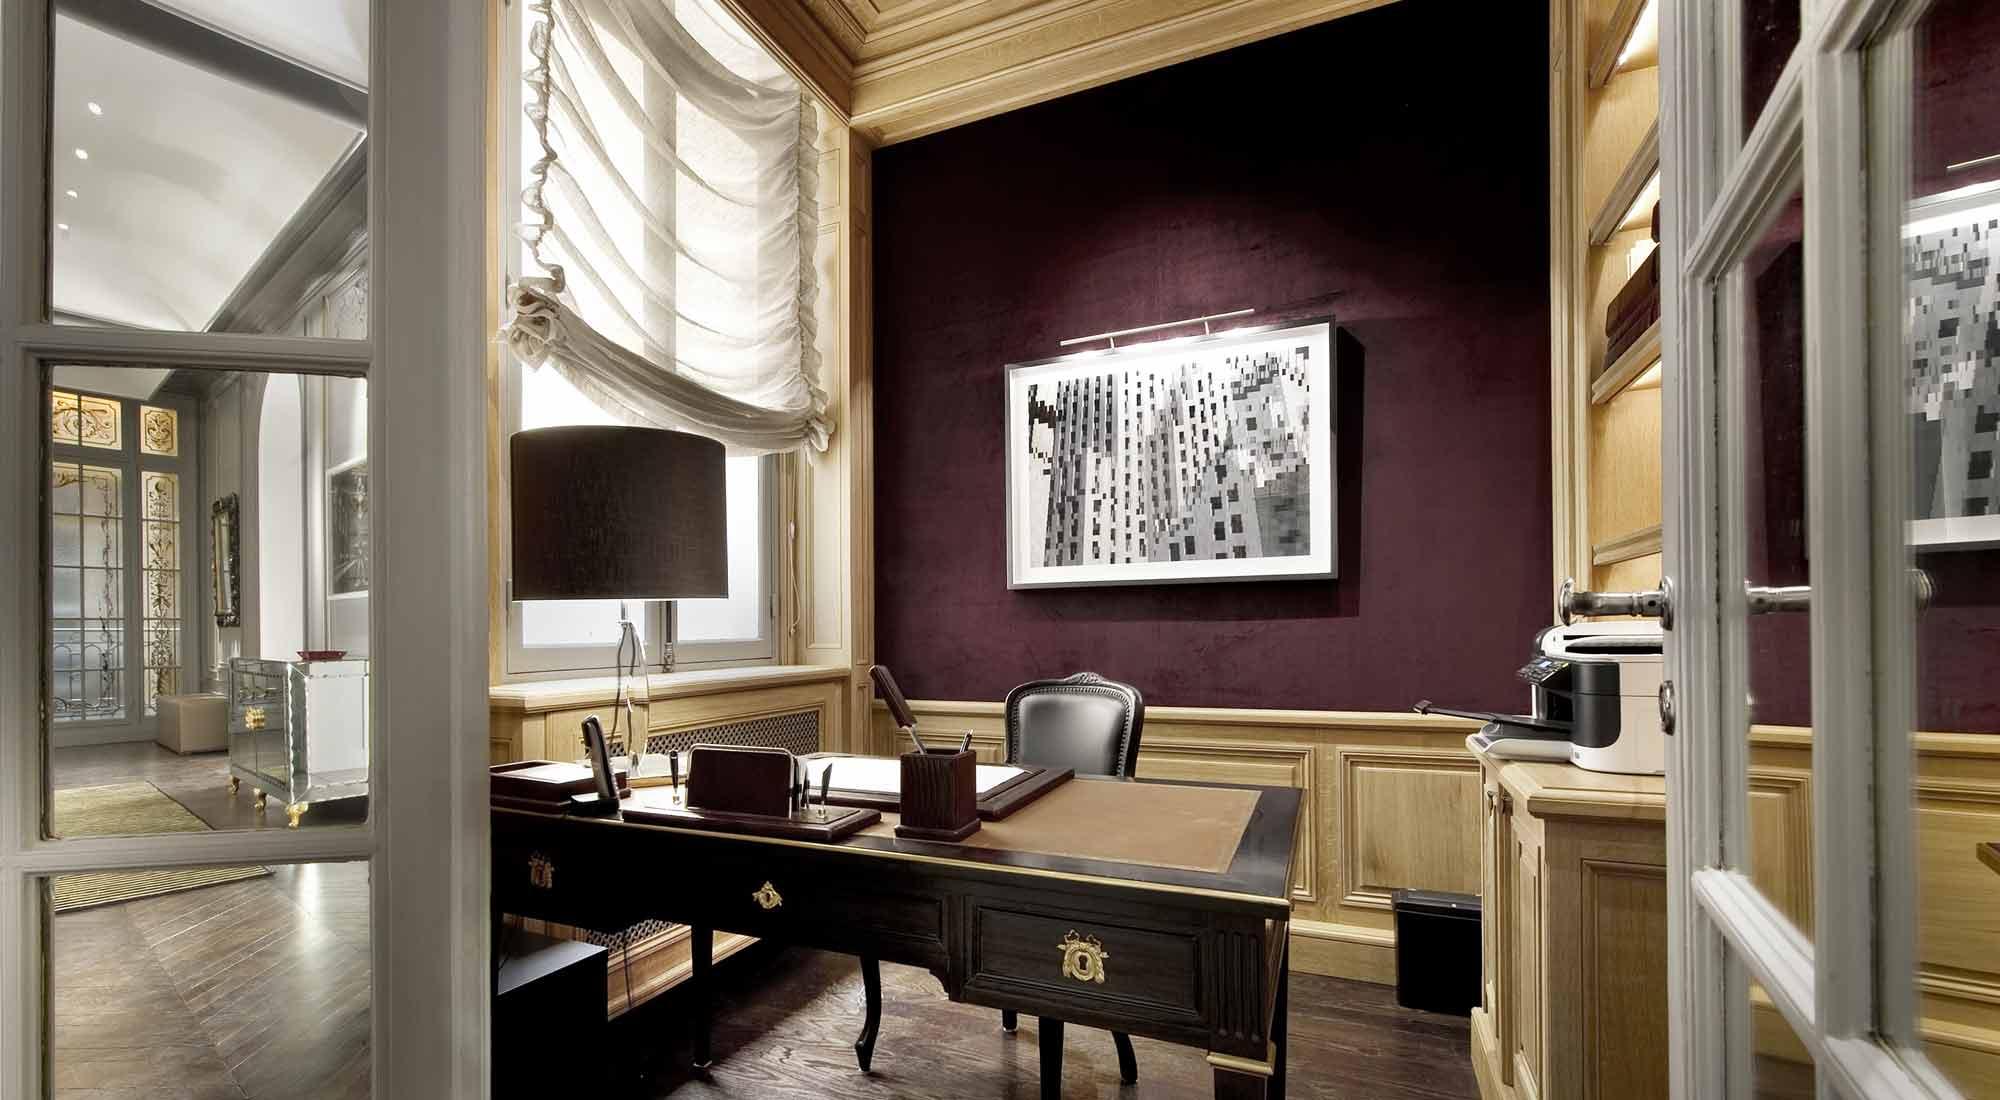 Paris luxury apartment for rent in the 16th